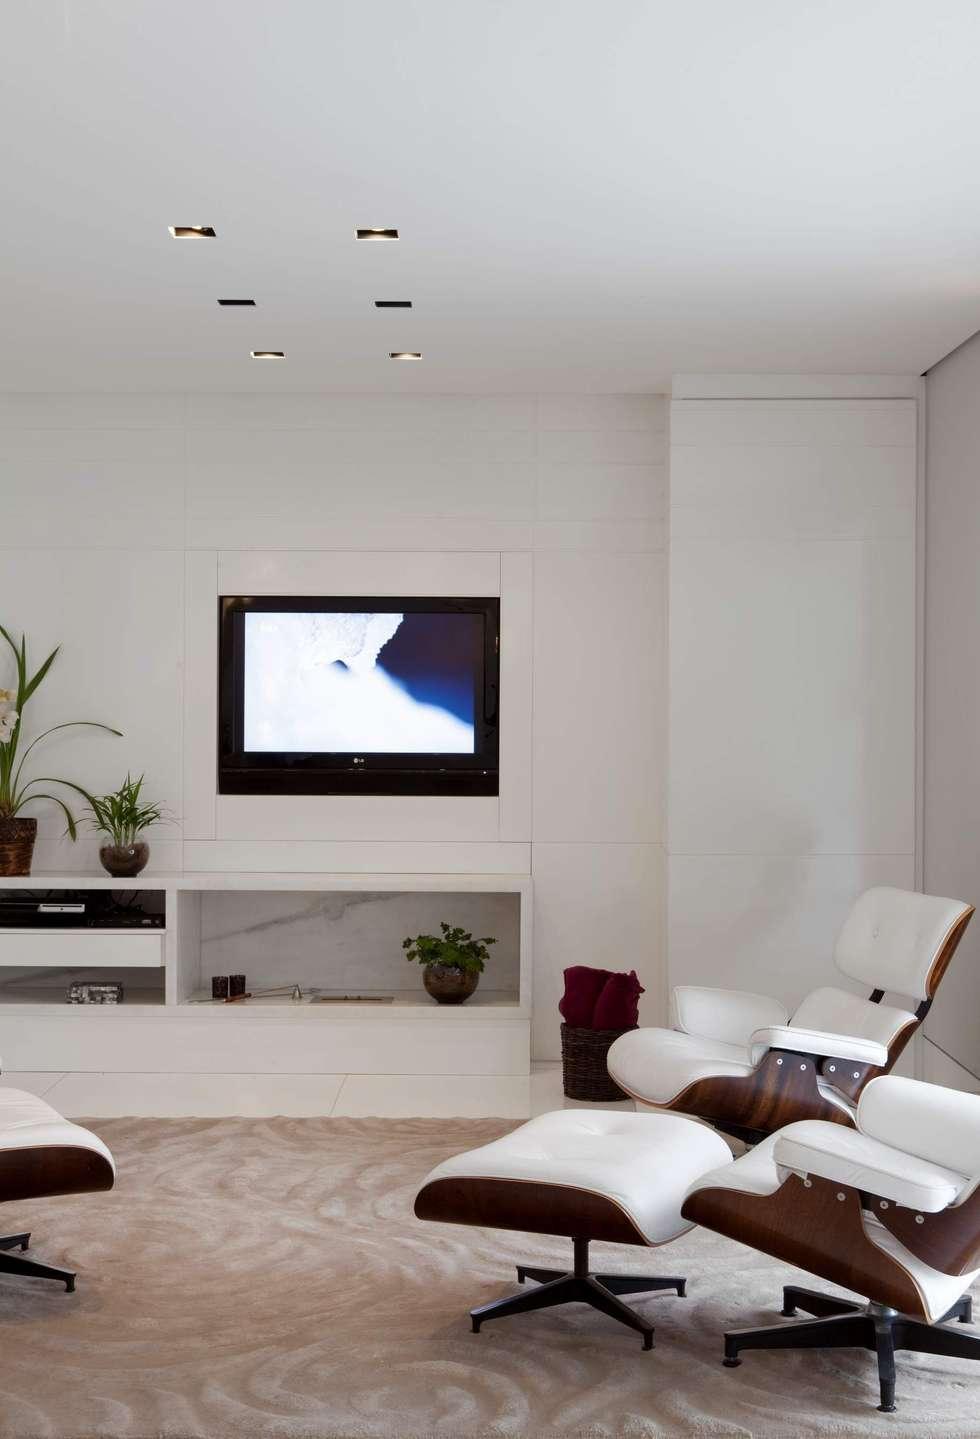 Top House SP: Salas multimídia minimalistas por Cristina Menezes Arquitetura